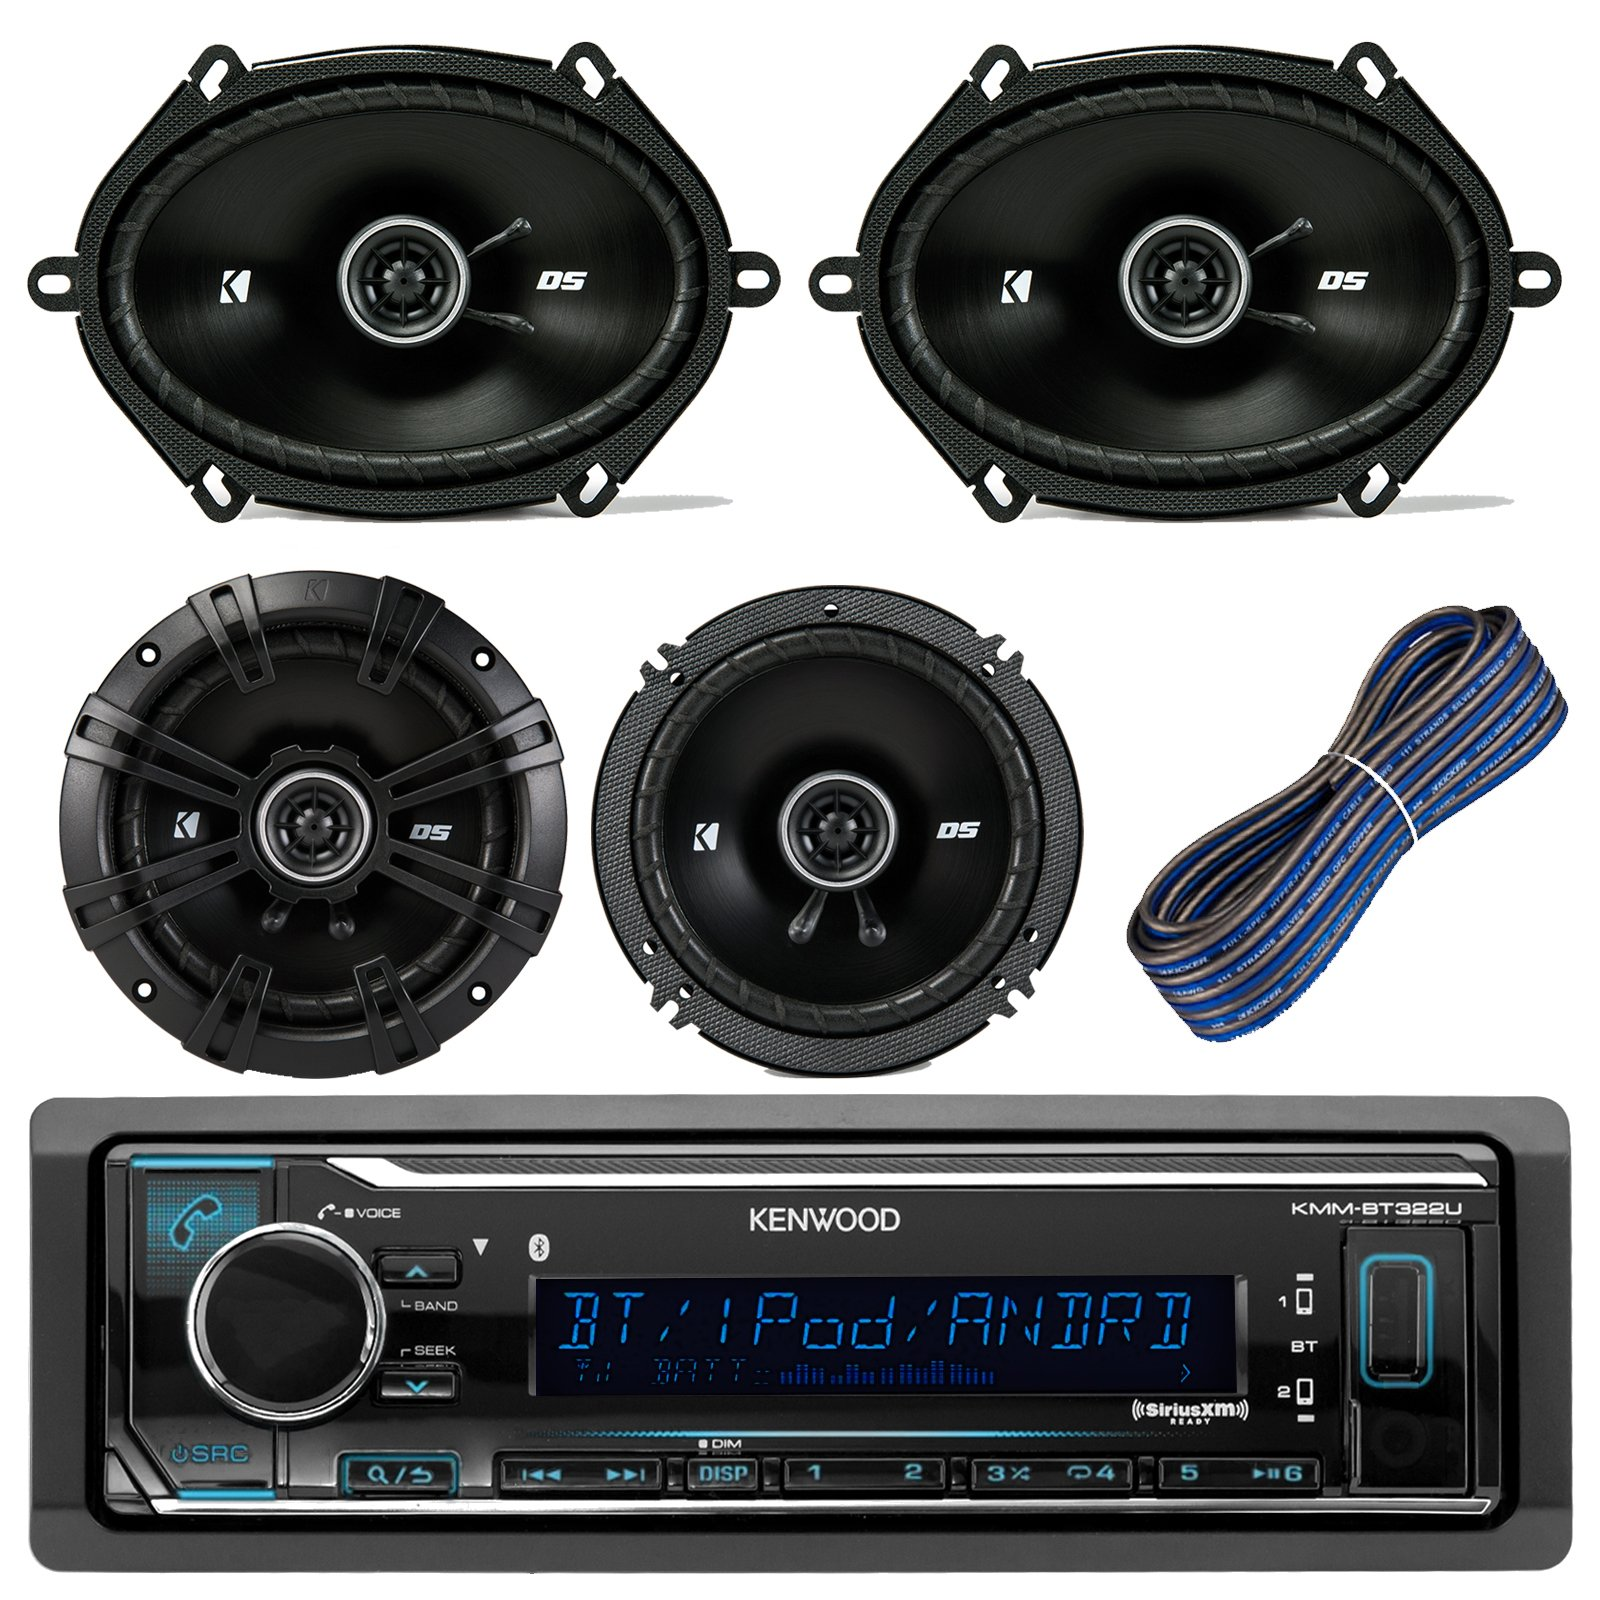 Kenwood Car Stereo Receiver With Bluetooth USB AUX AM FM Bundle Kit With 2 Kicker 41DSC684 6x8'' Car Audio Speakers + 2 Kicker DSC654 6.5'' Speaker + Kicker 20-Feet 16-AWG Speaker Wire